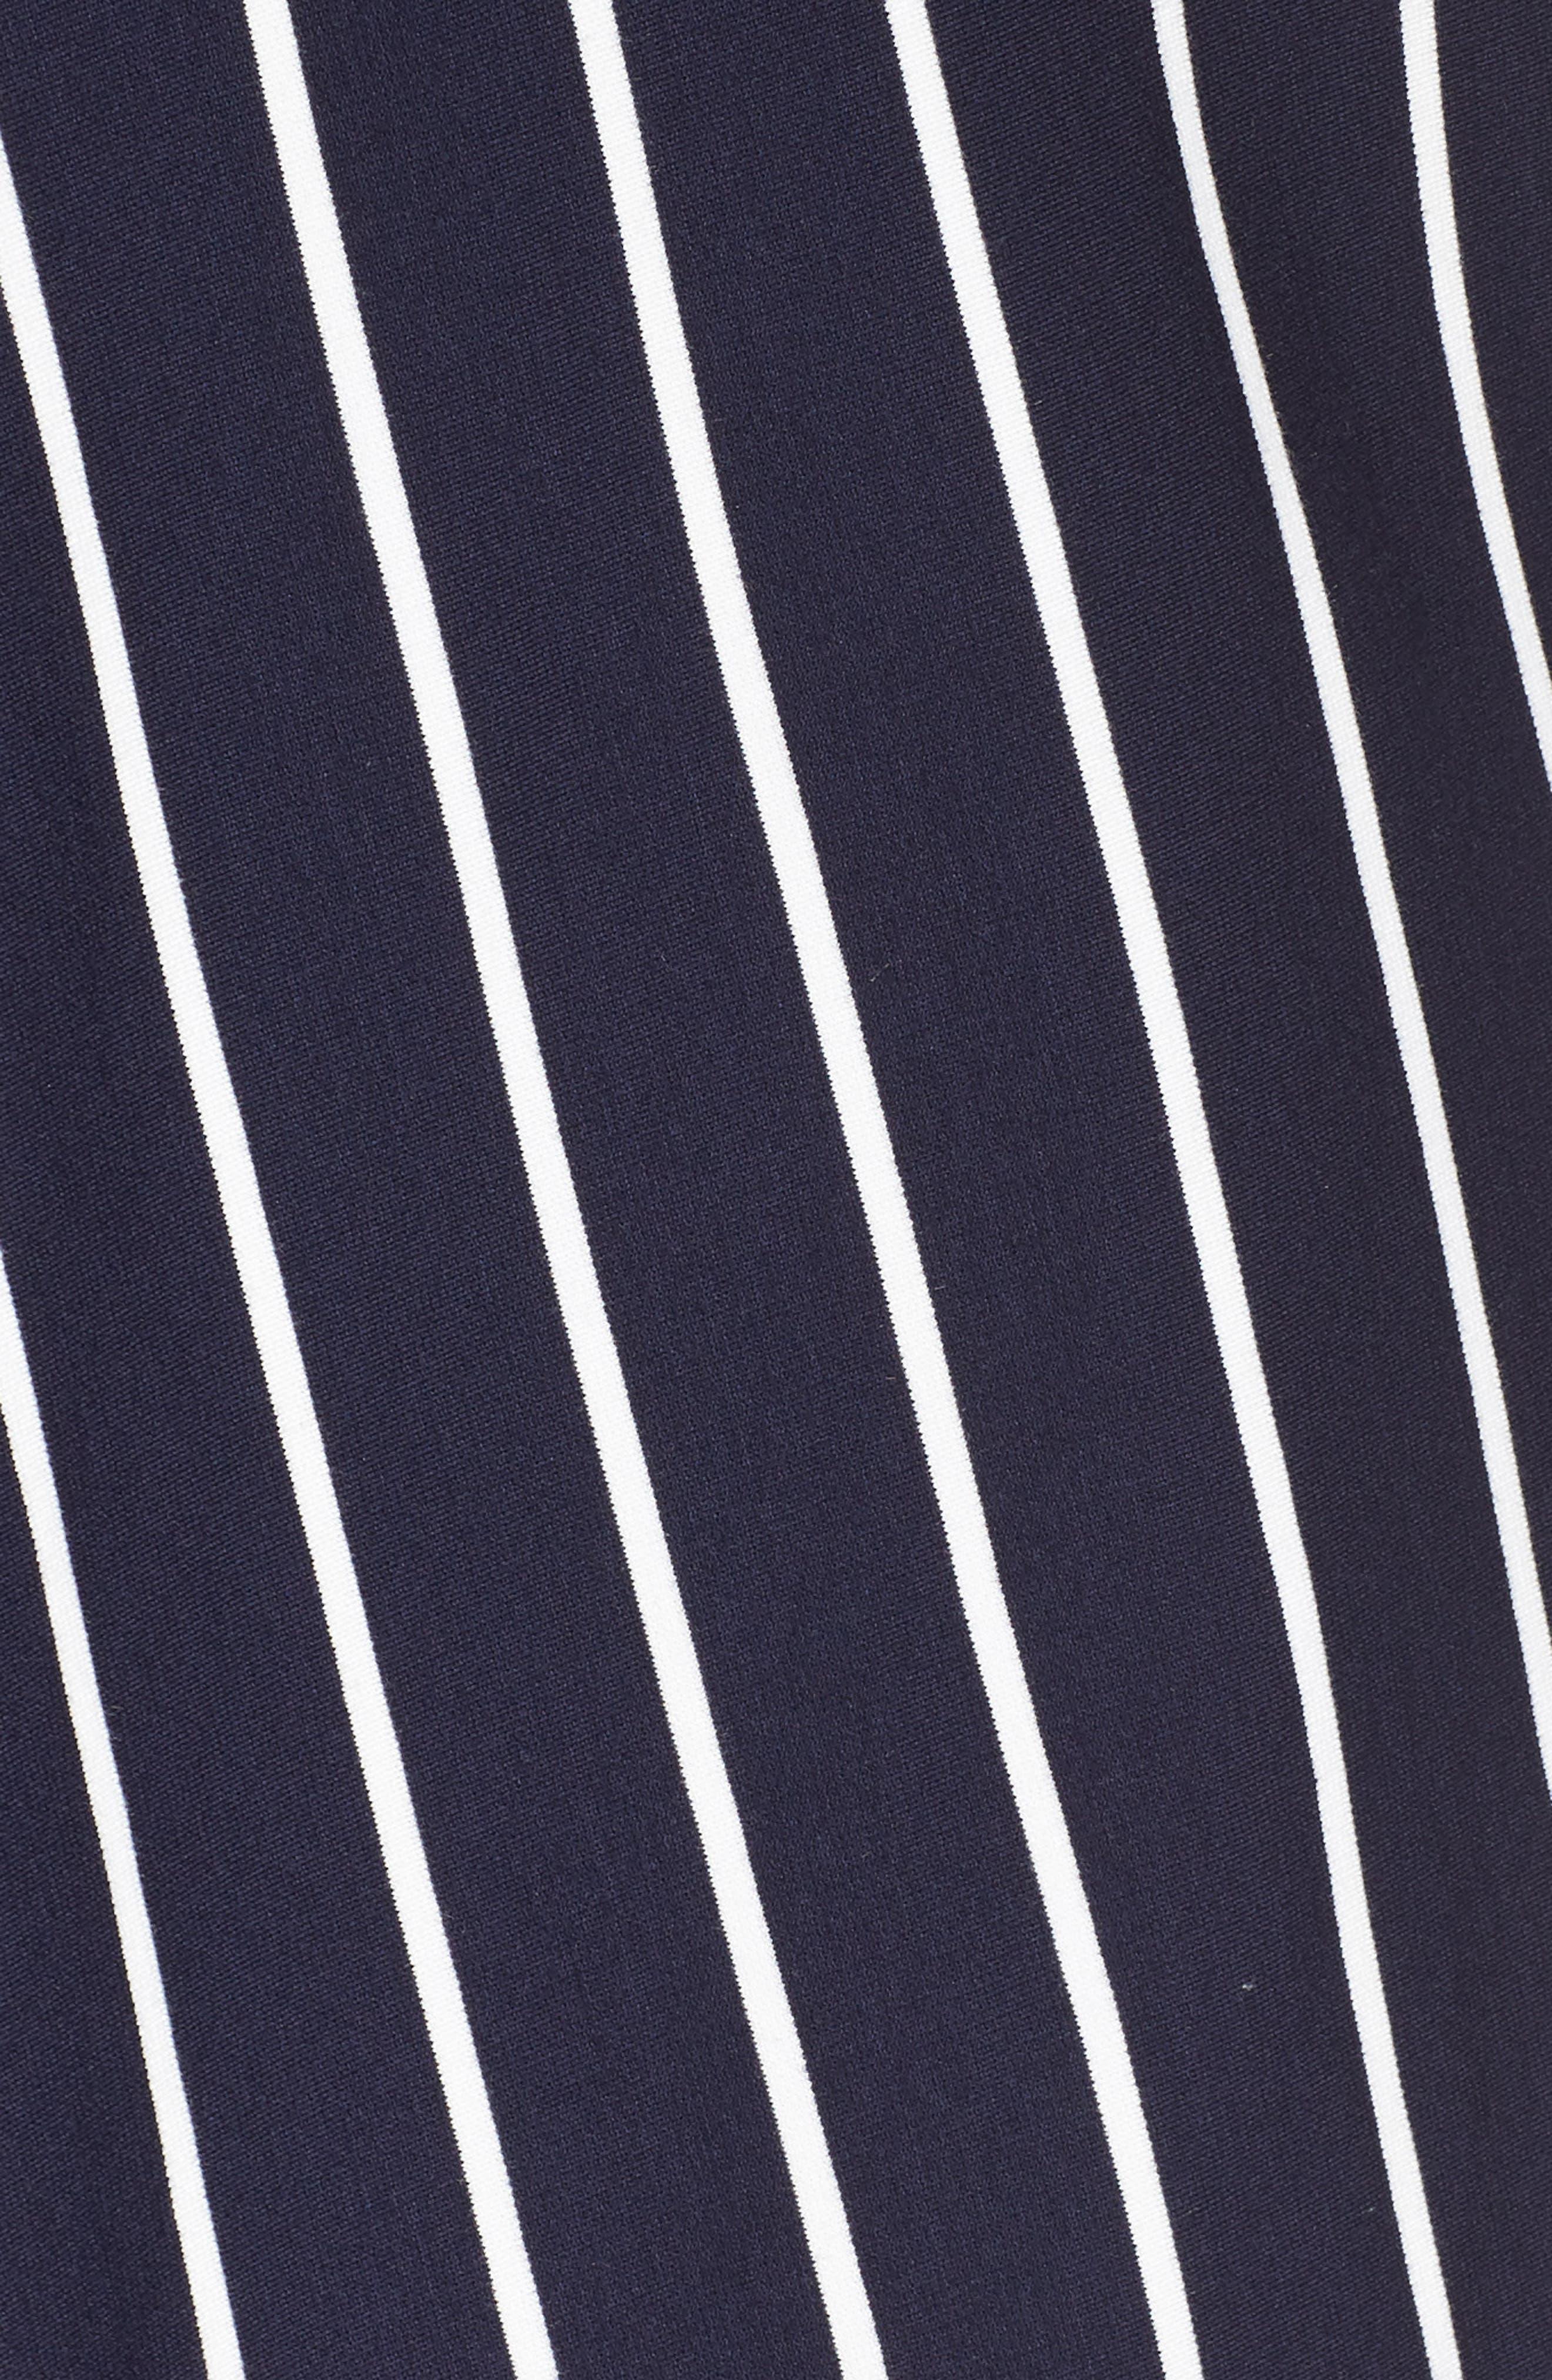 Stripe Ponte Fit & Flare Dress,                             Alternate thumbnail 5, color,                             Navy- White Stripe